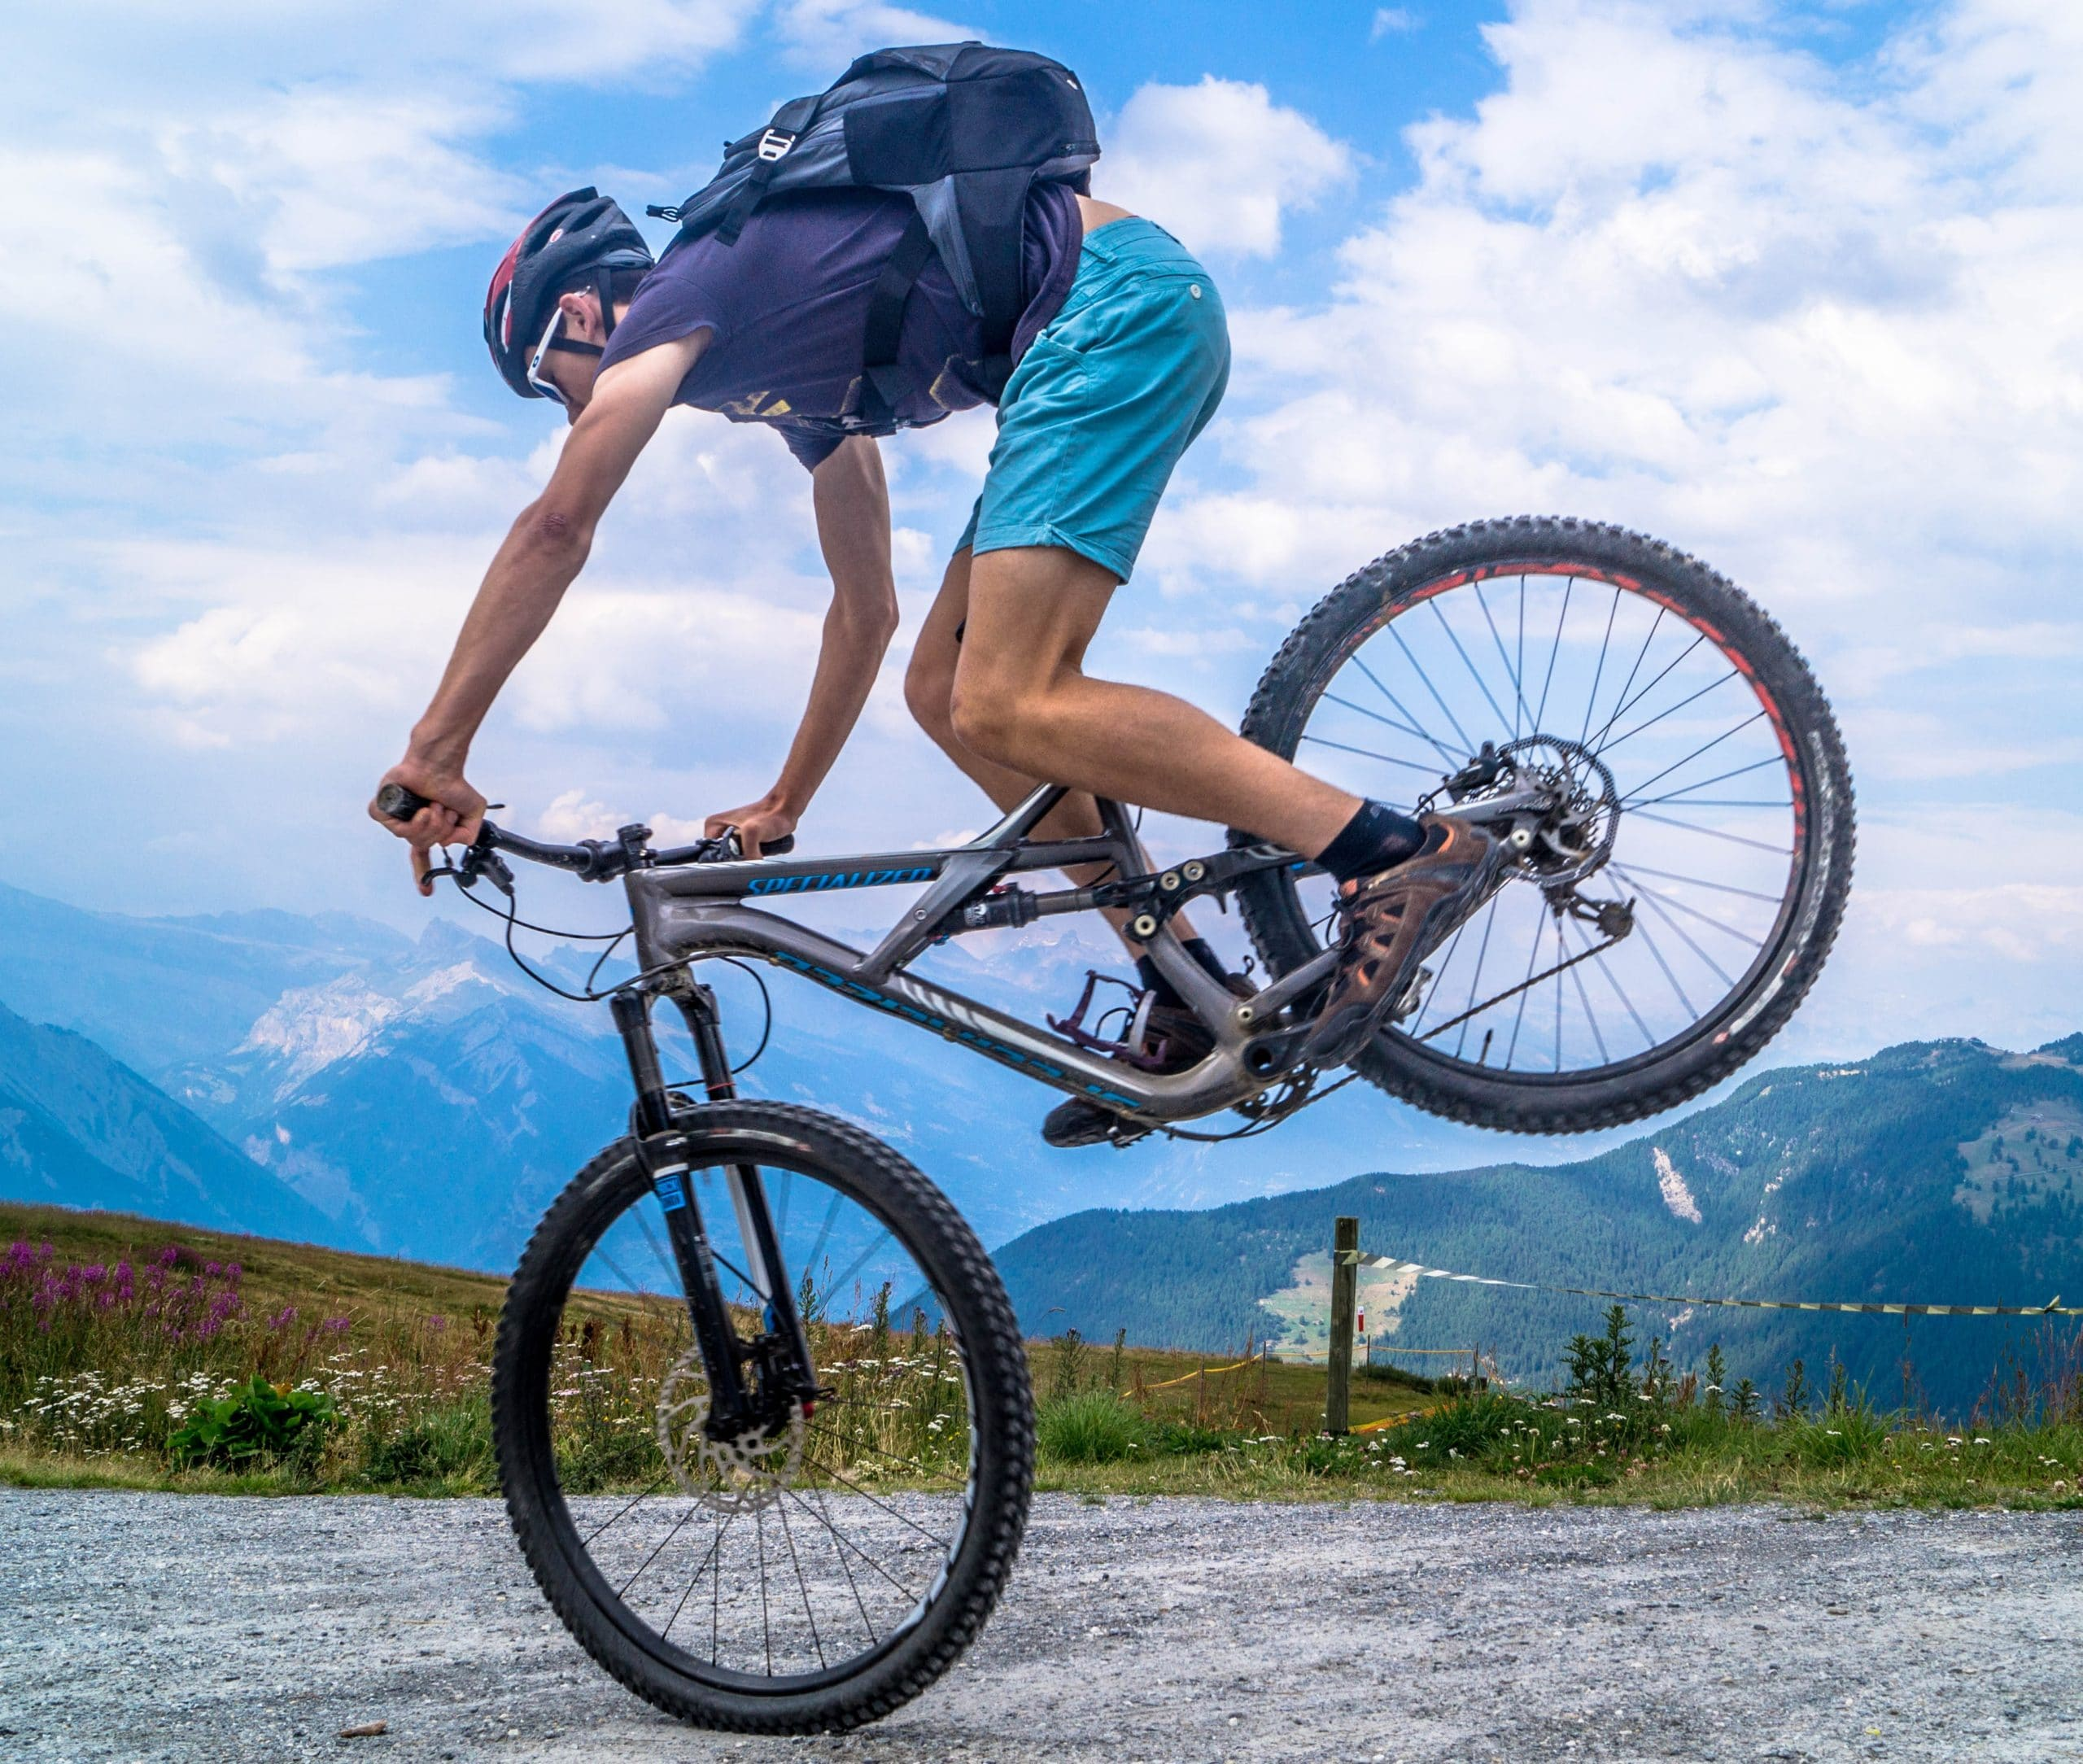 Durability of a Carbon Mountain Bike vs. Aluminum: Image of mountain bike nose stall